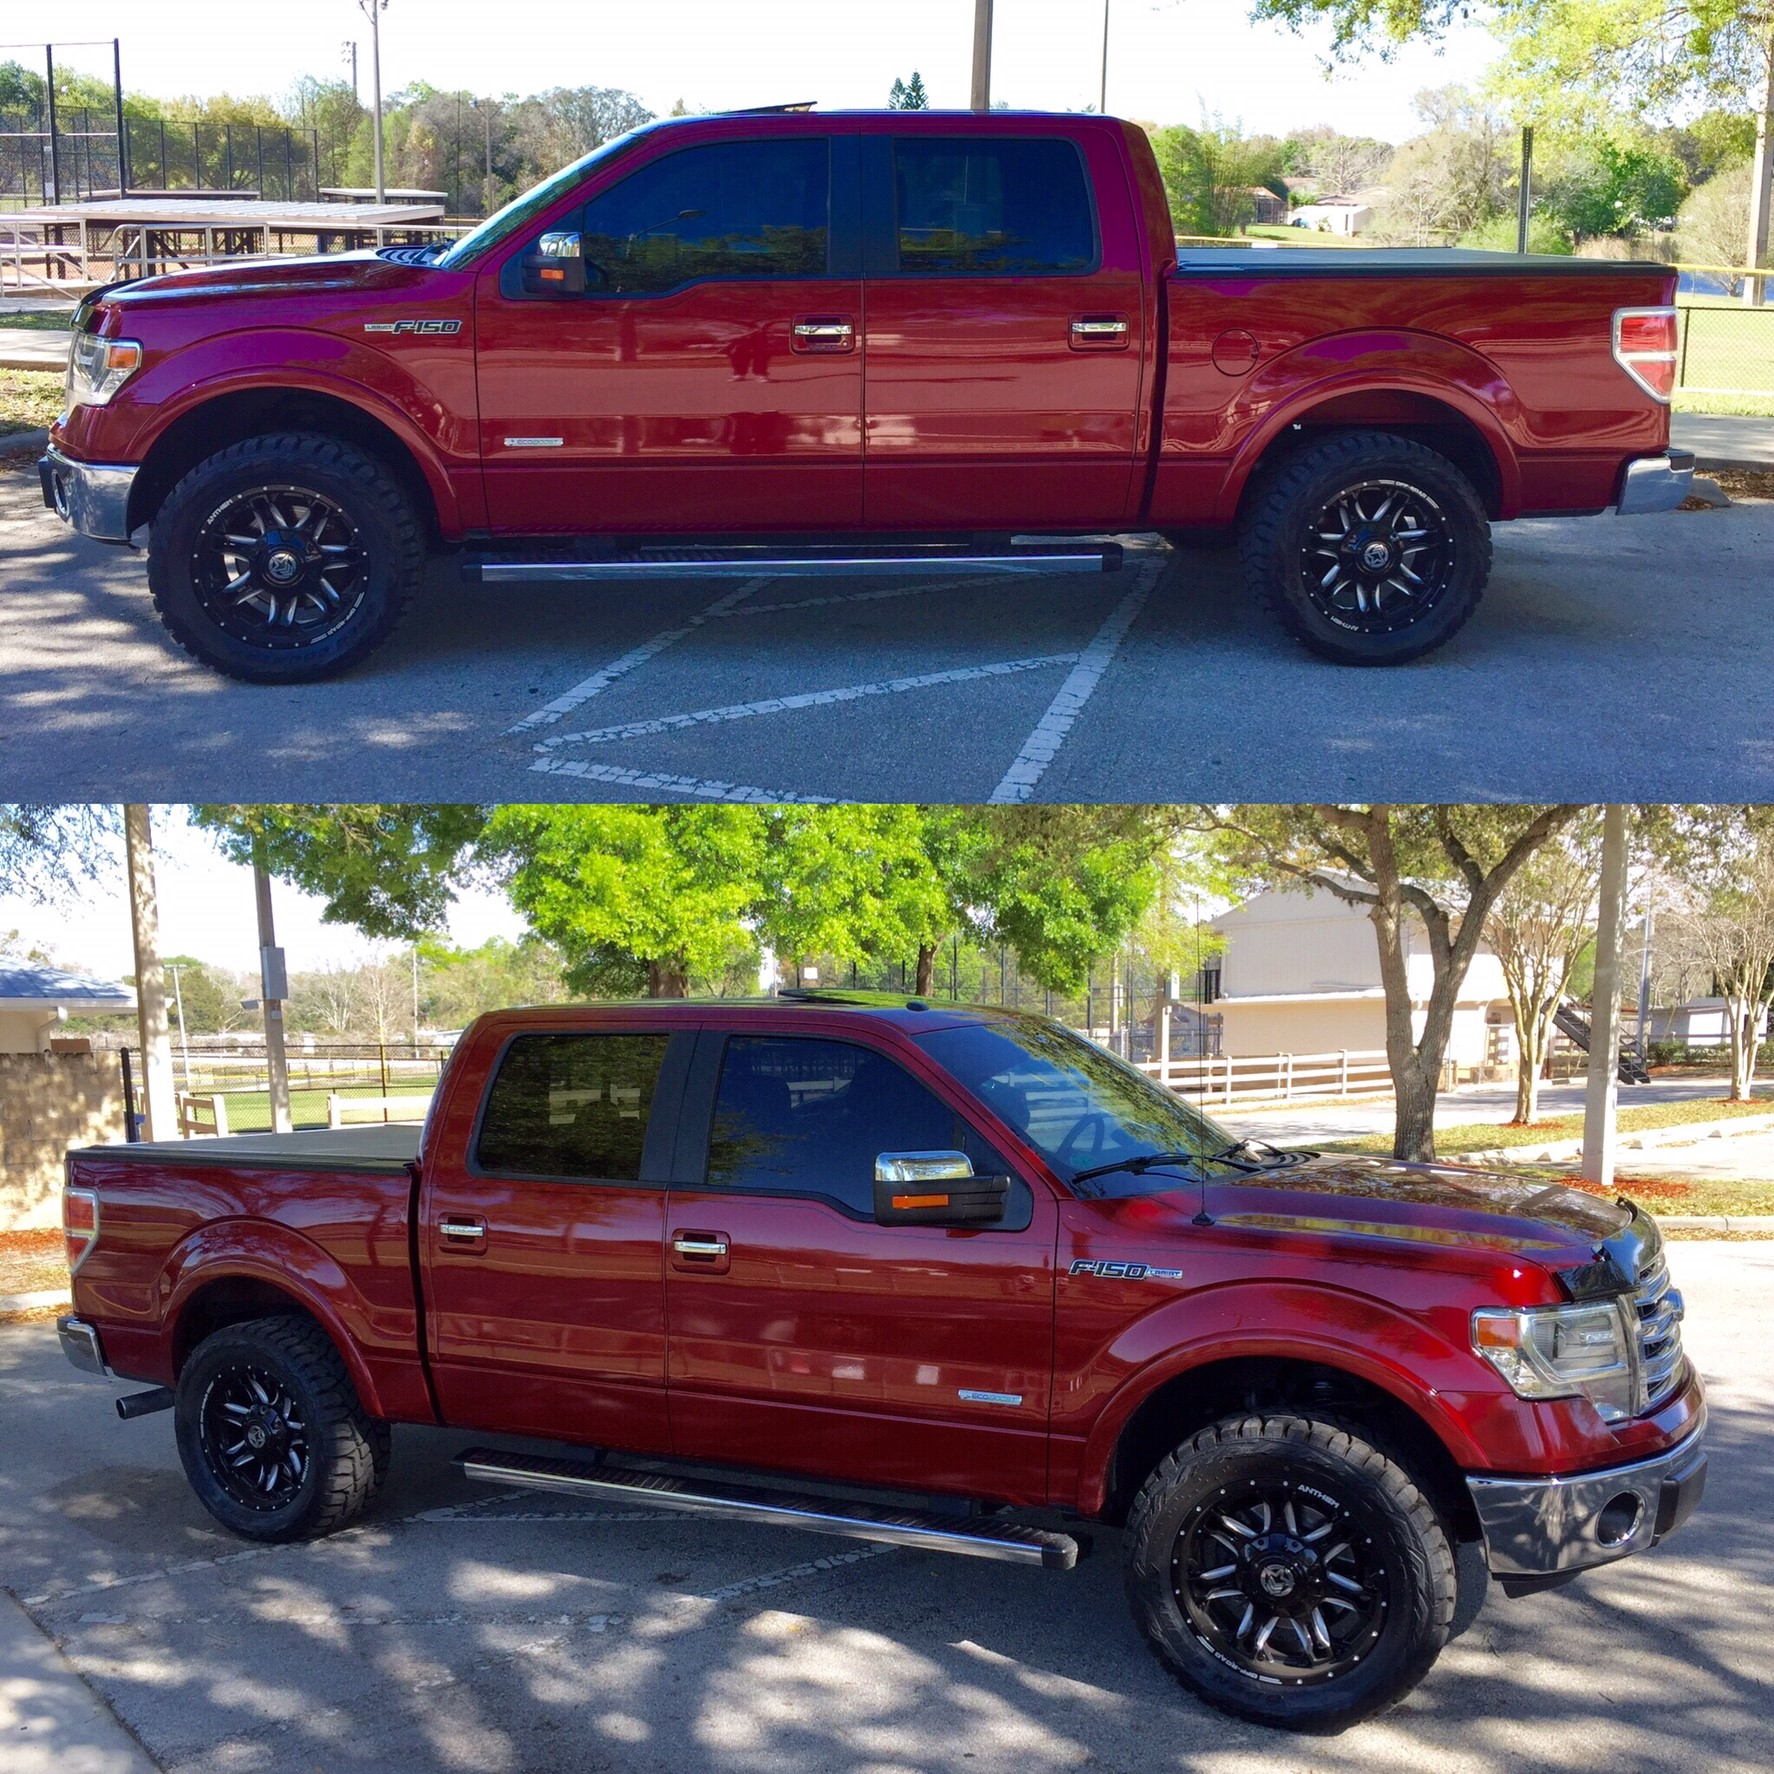 f150 ruby chrome metallic rims kit leveling ford lariat forum wheels air tires open offset anthem rear truck supercrew rt